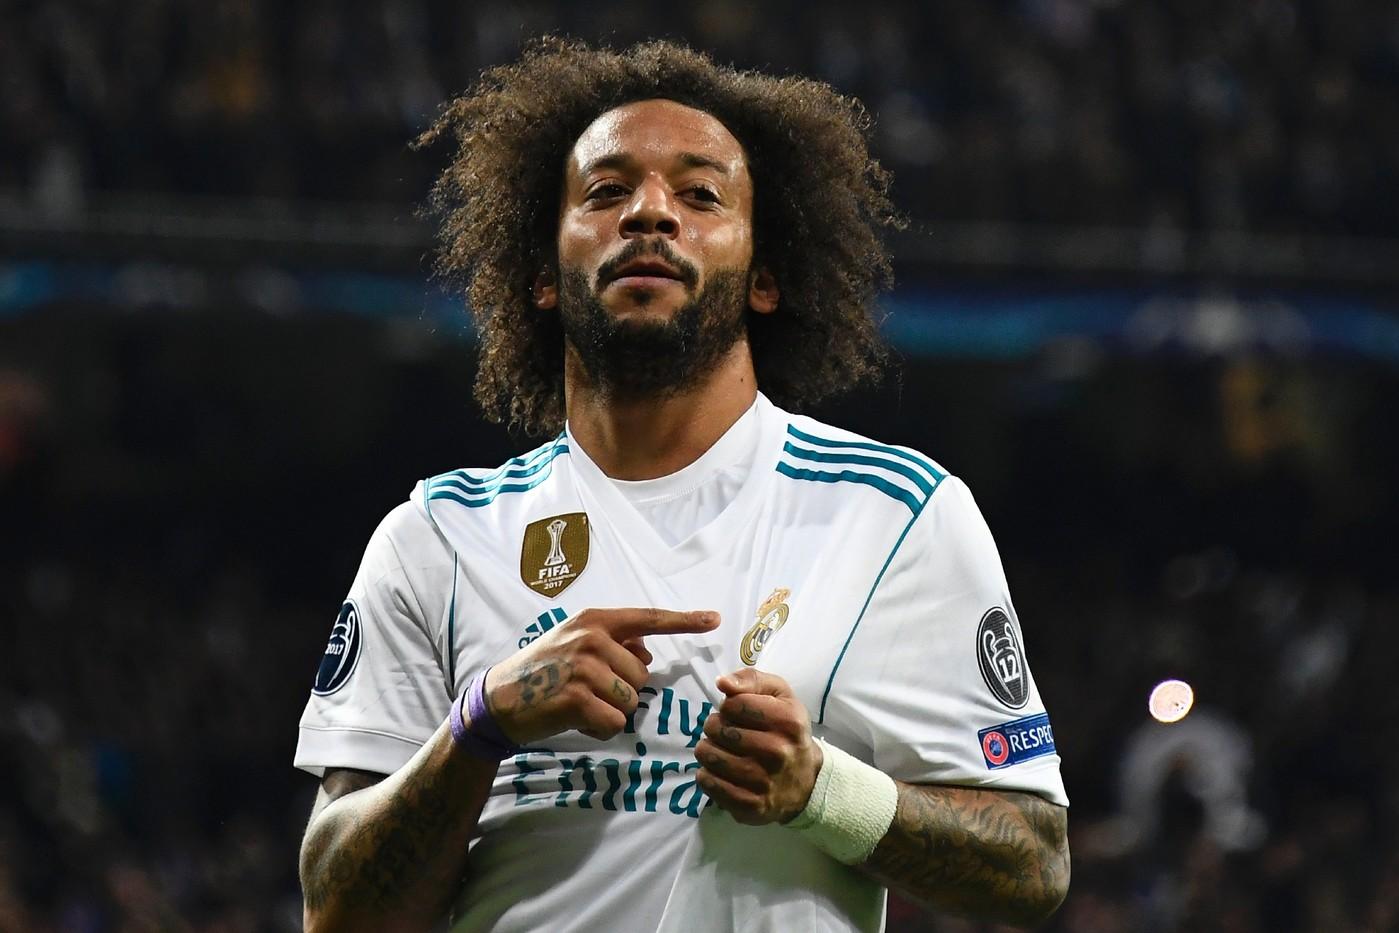 Real Madrid Wallpaper Hd Real Madrid La Ligue Des Champions Dans Les G 232 Nes